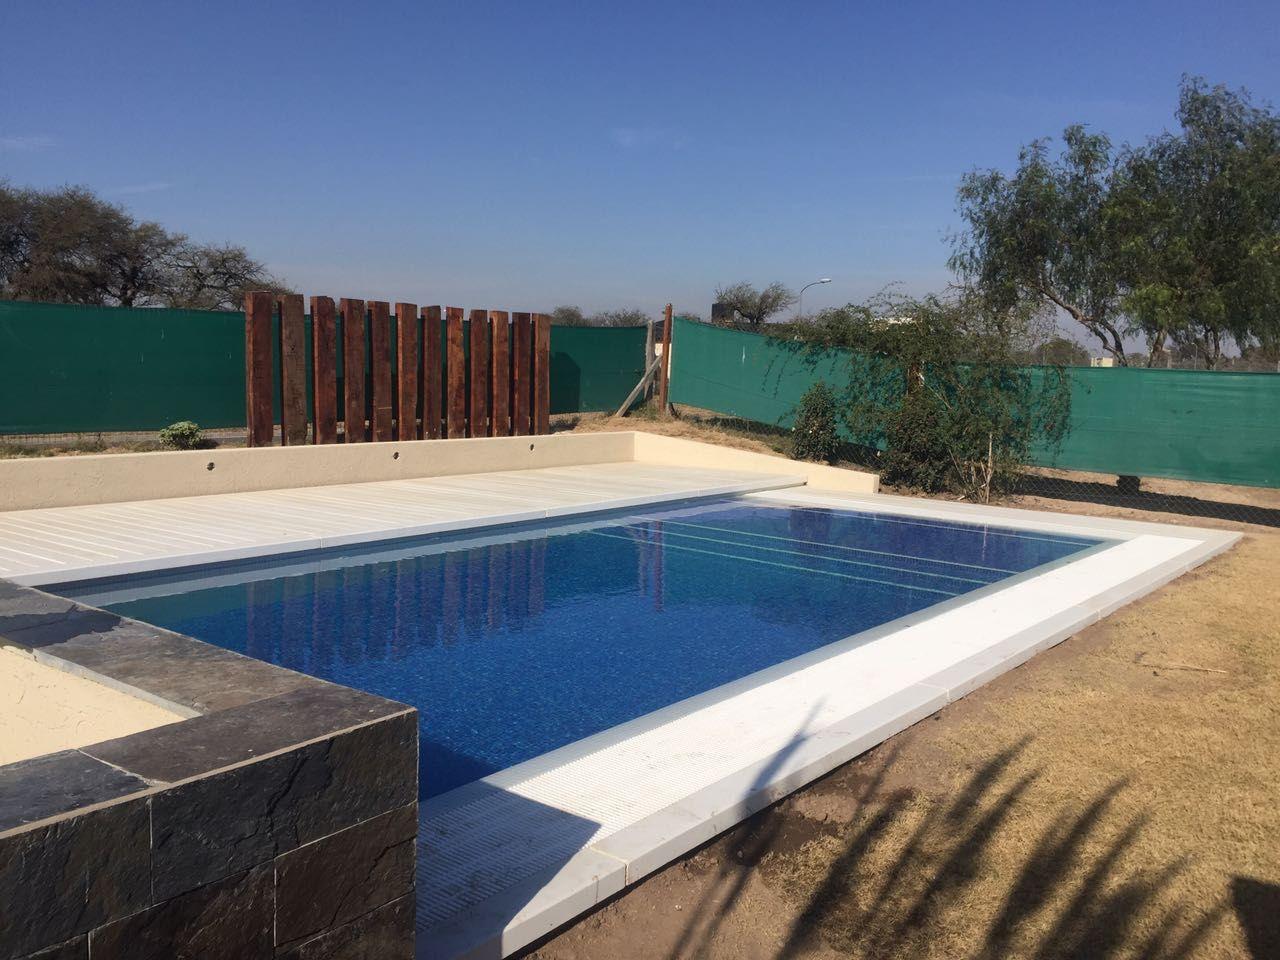 piscina + wellness + diseÑo exclusivos + solarium + deck de